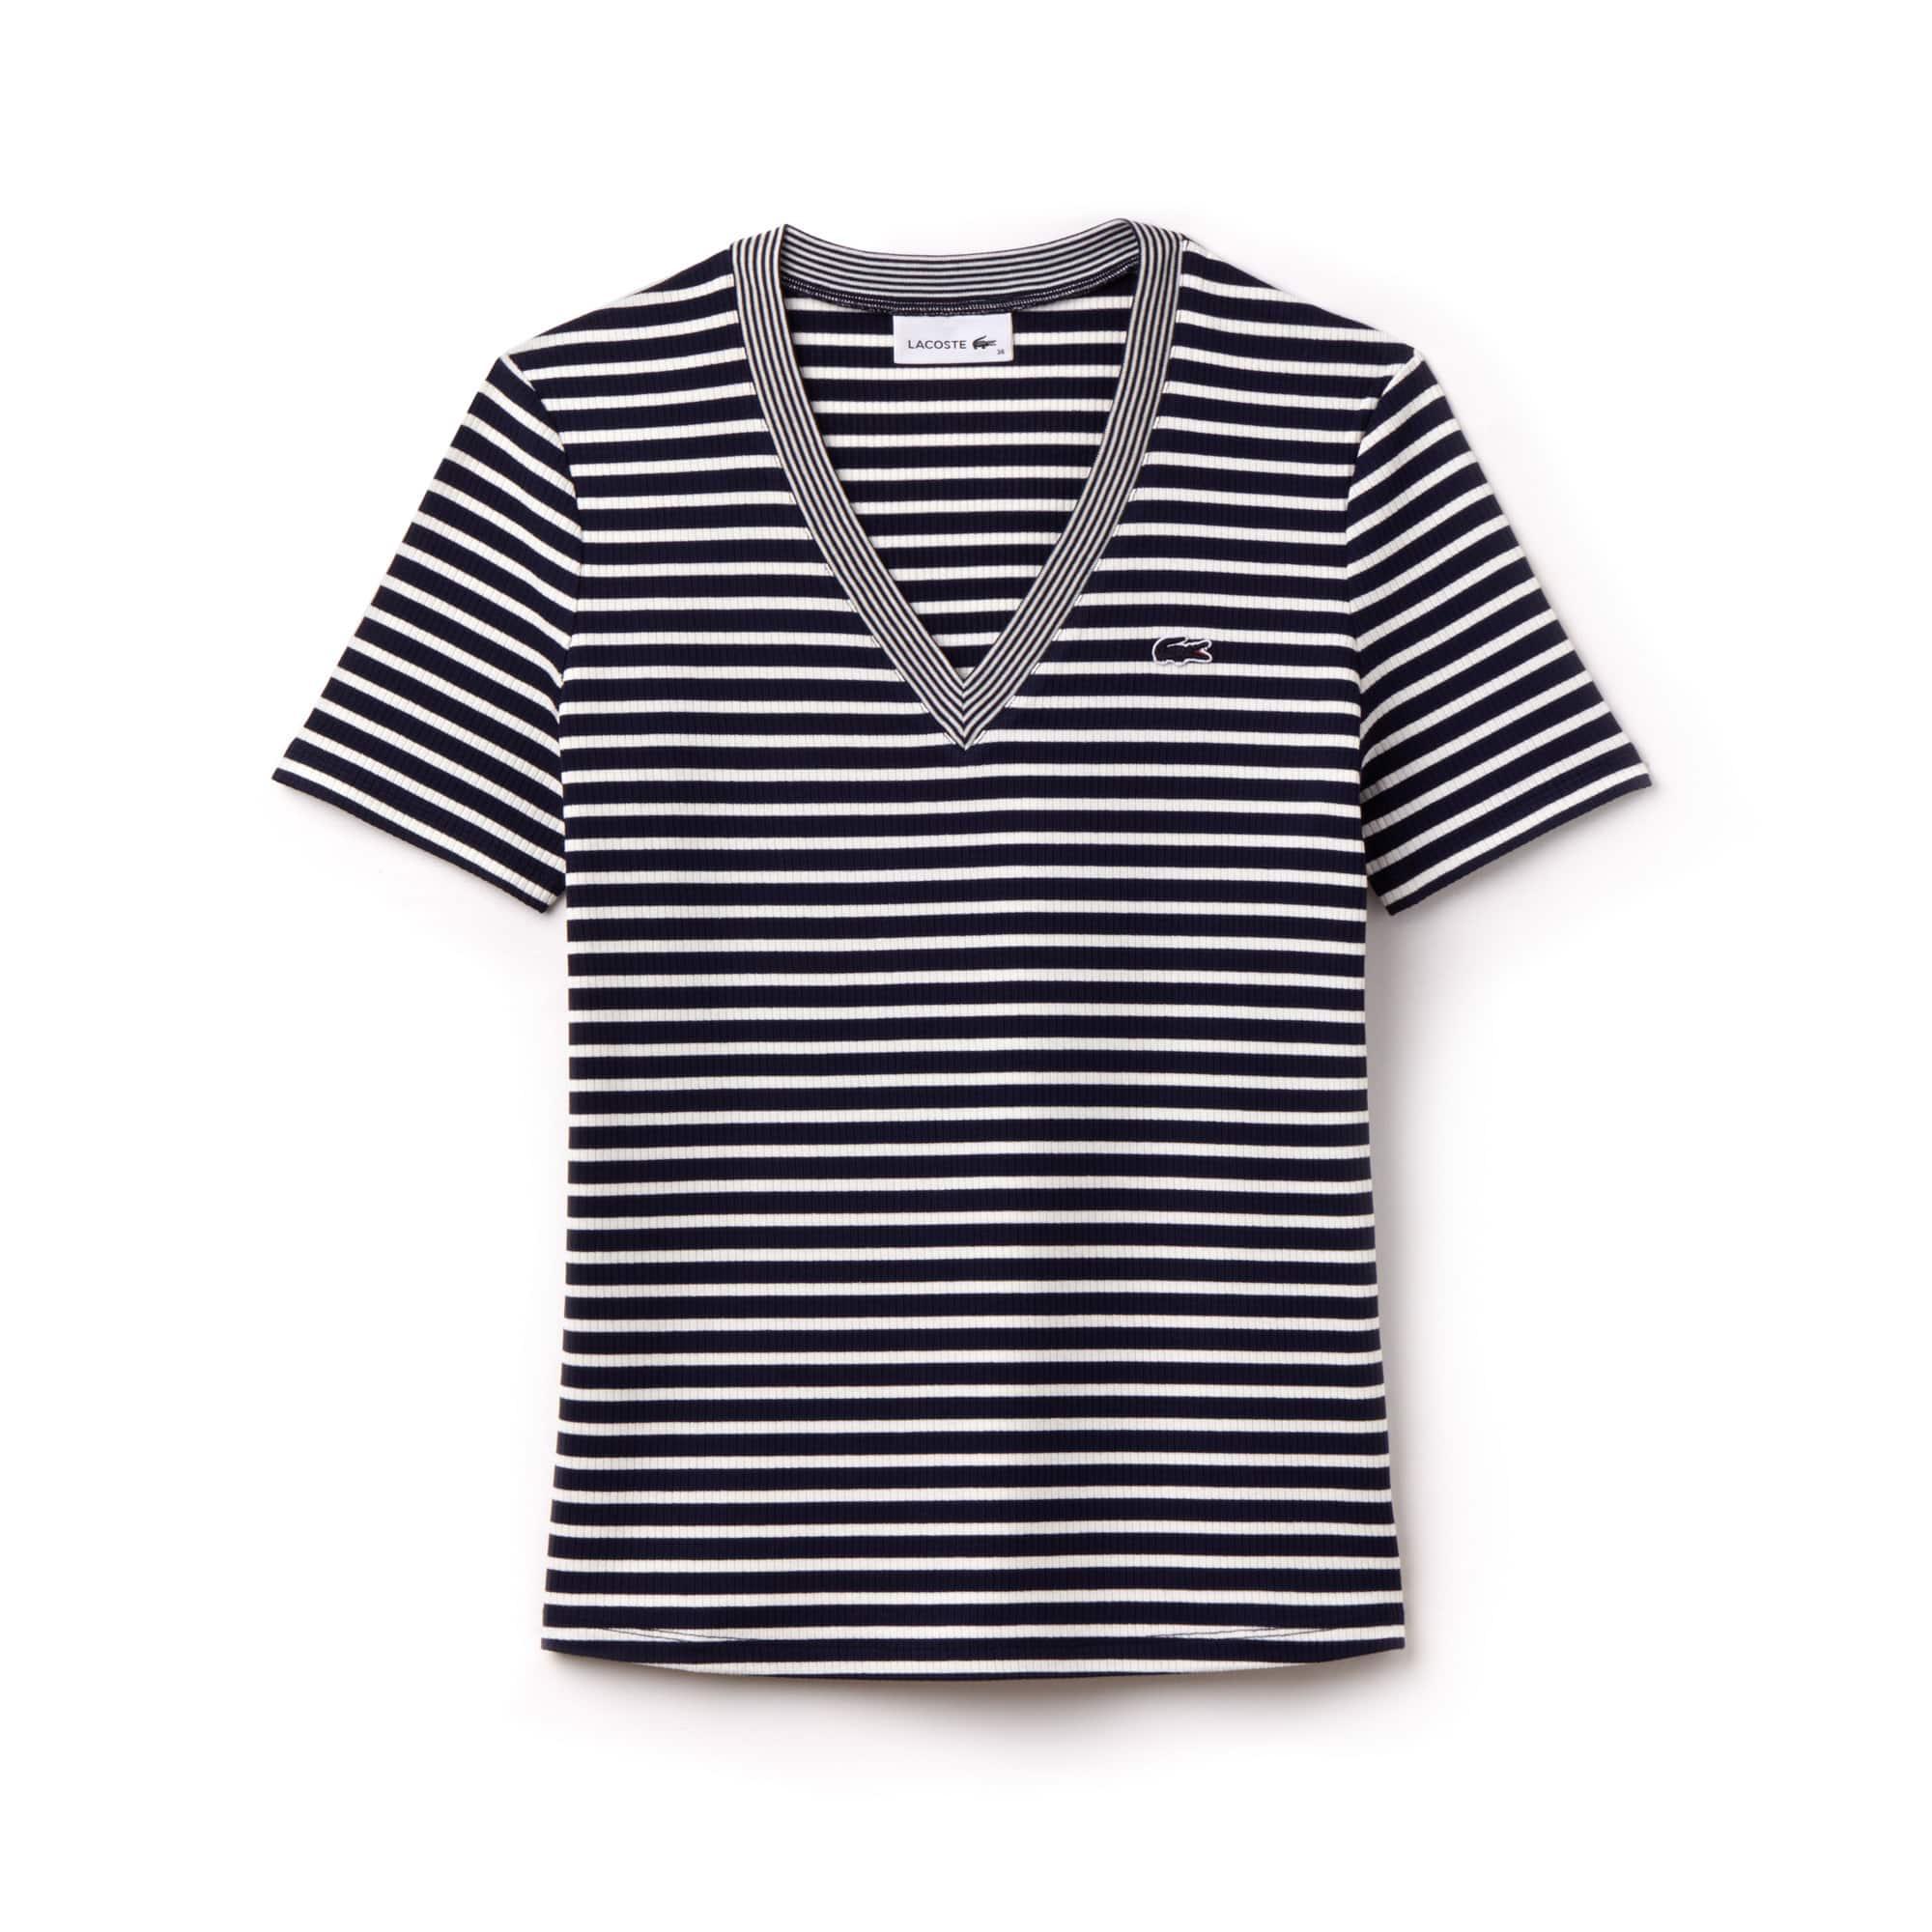 Women's V-neck Striped Stretch Cotton T-shirt